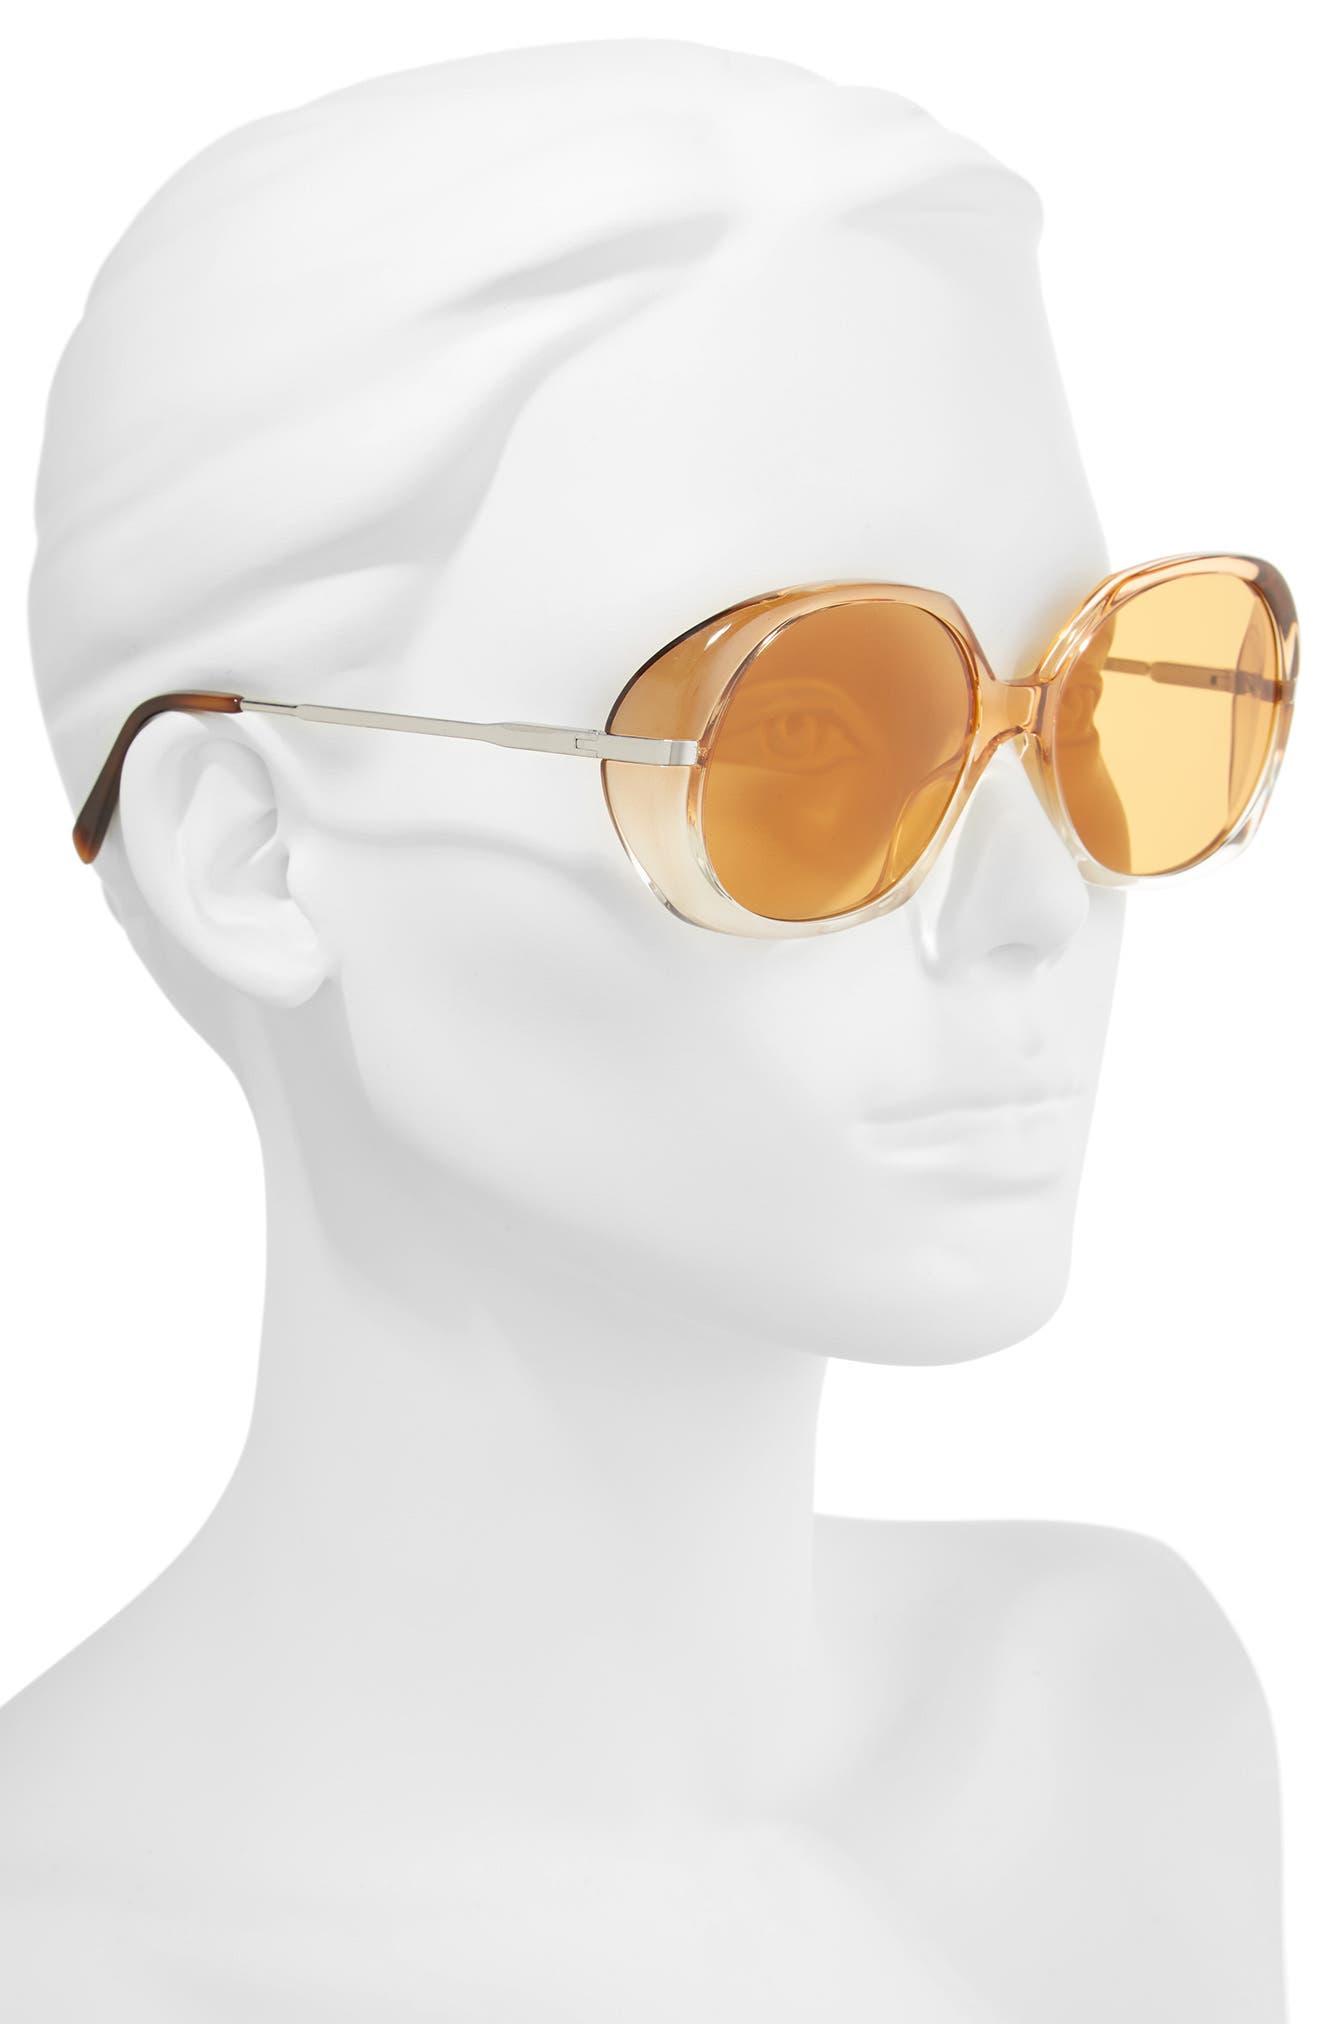 56mm Round Sunglasses,                             Alternate thumbnail 2, color,                             200